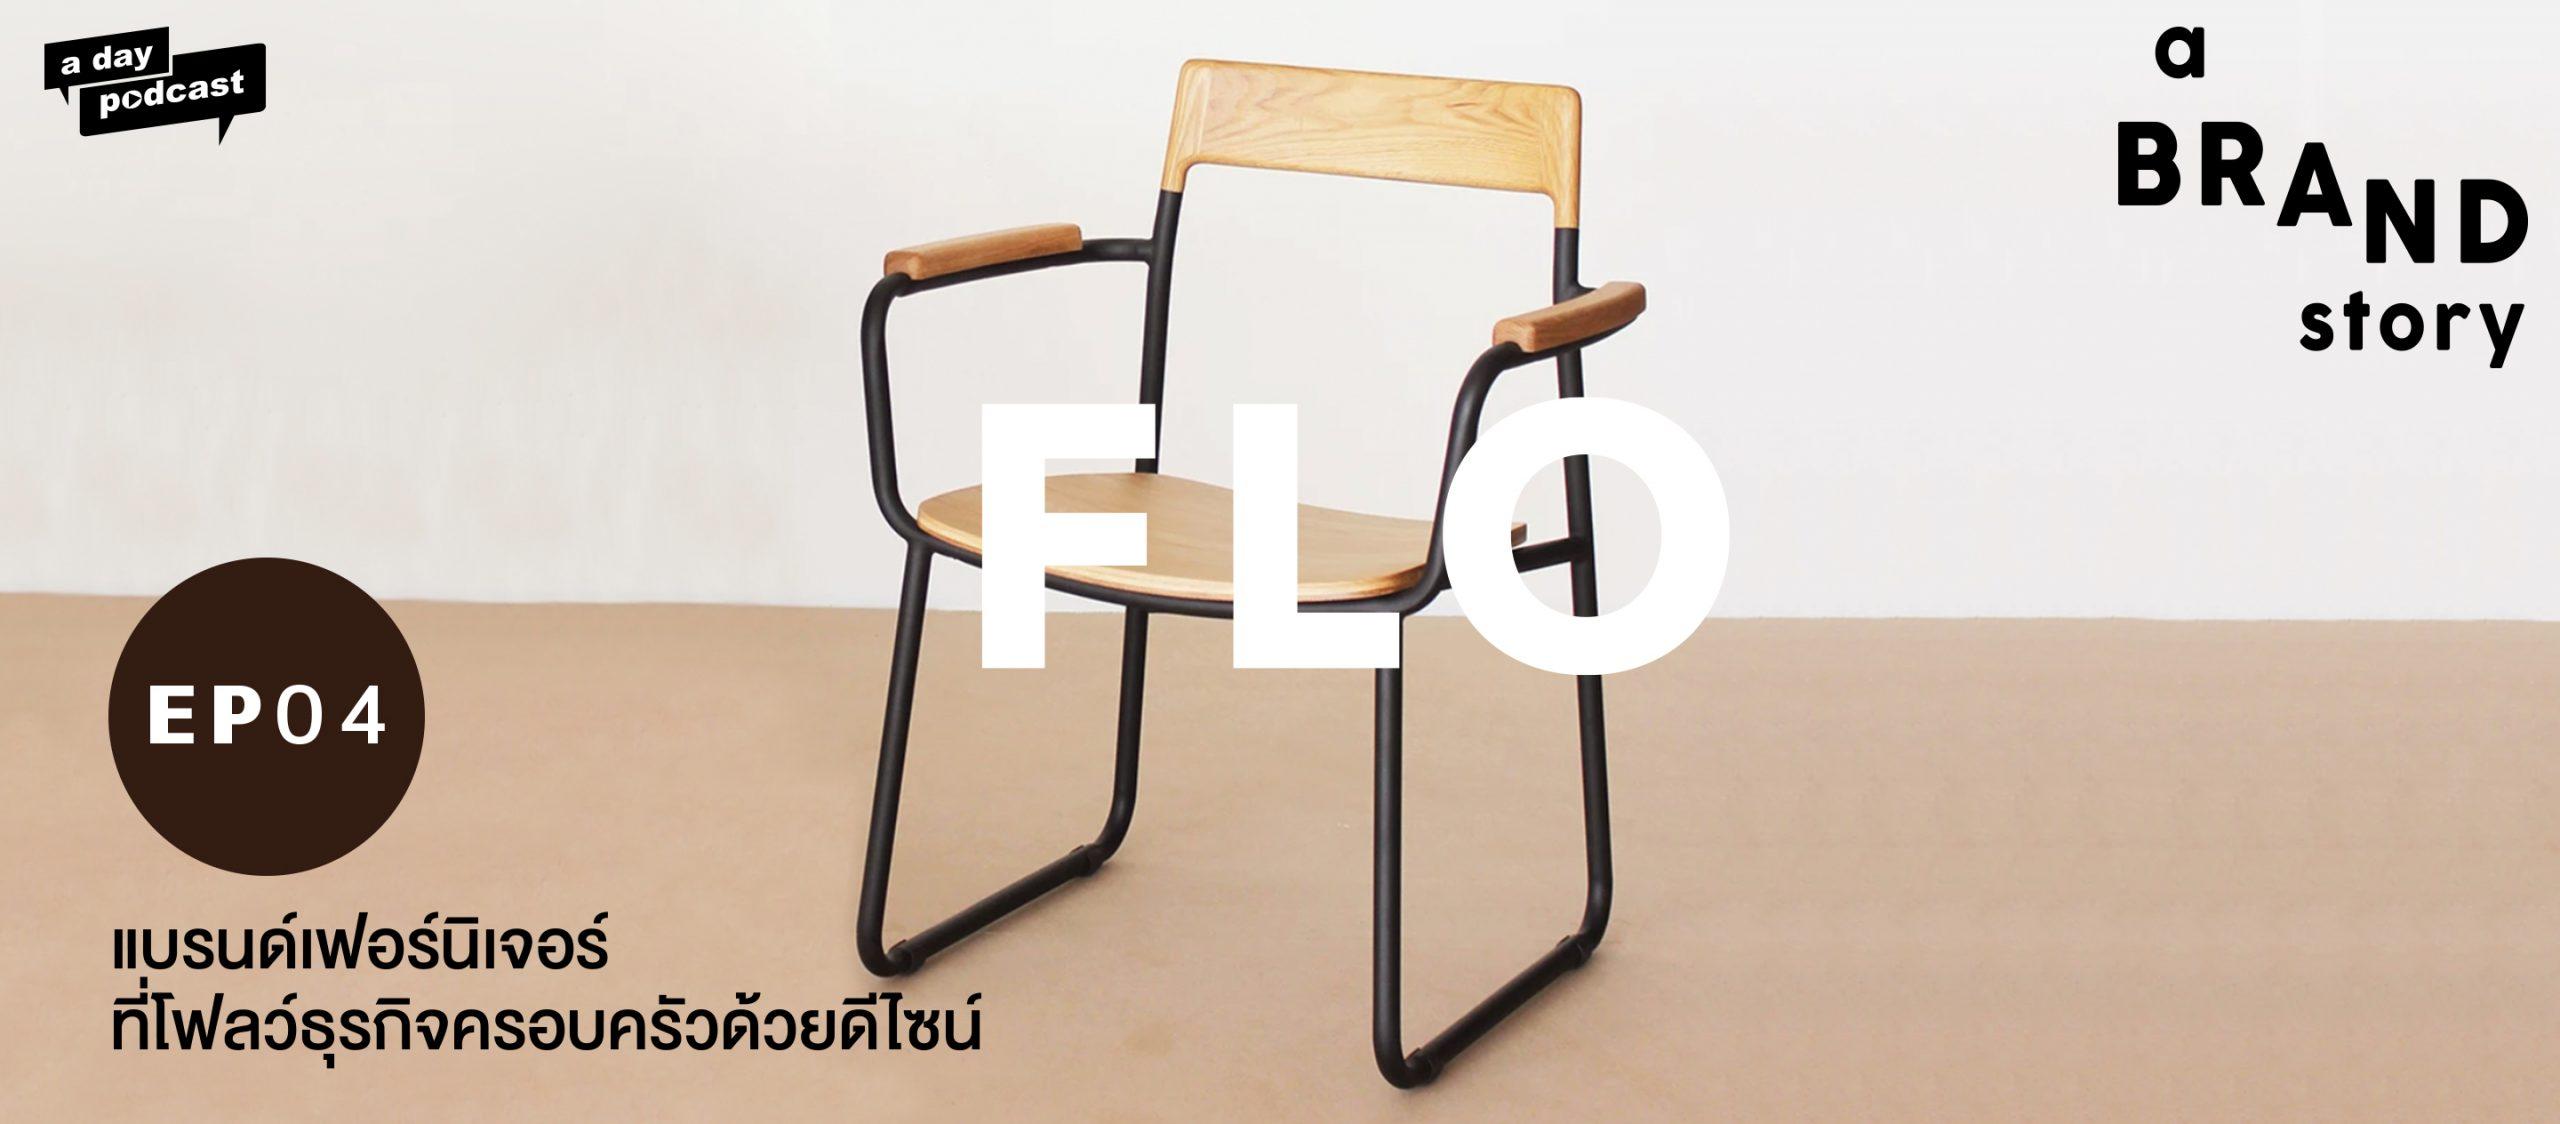 a BRAND story EP.04  Flo Furniture แบรนด์เฟอร์นิเจอร์ที่โฟลว์ธุรกิจครอบครัวด้วยดีไซน์